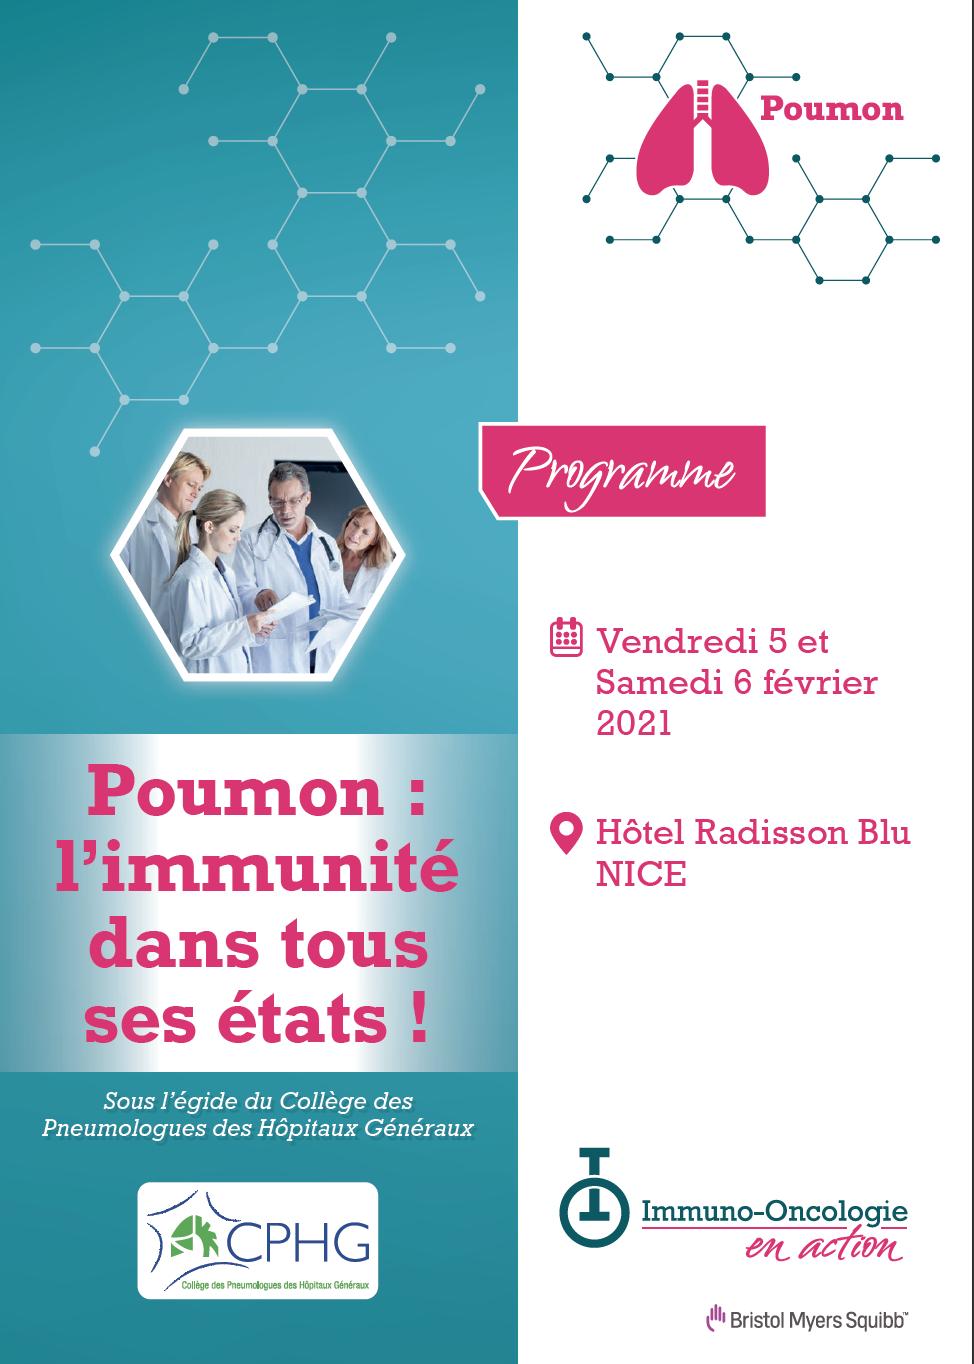 Poumon-imunite